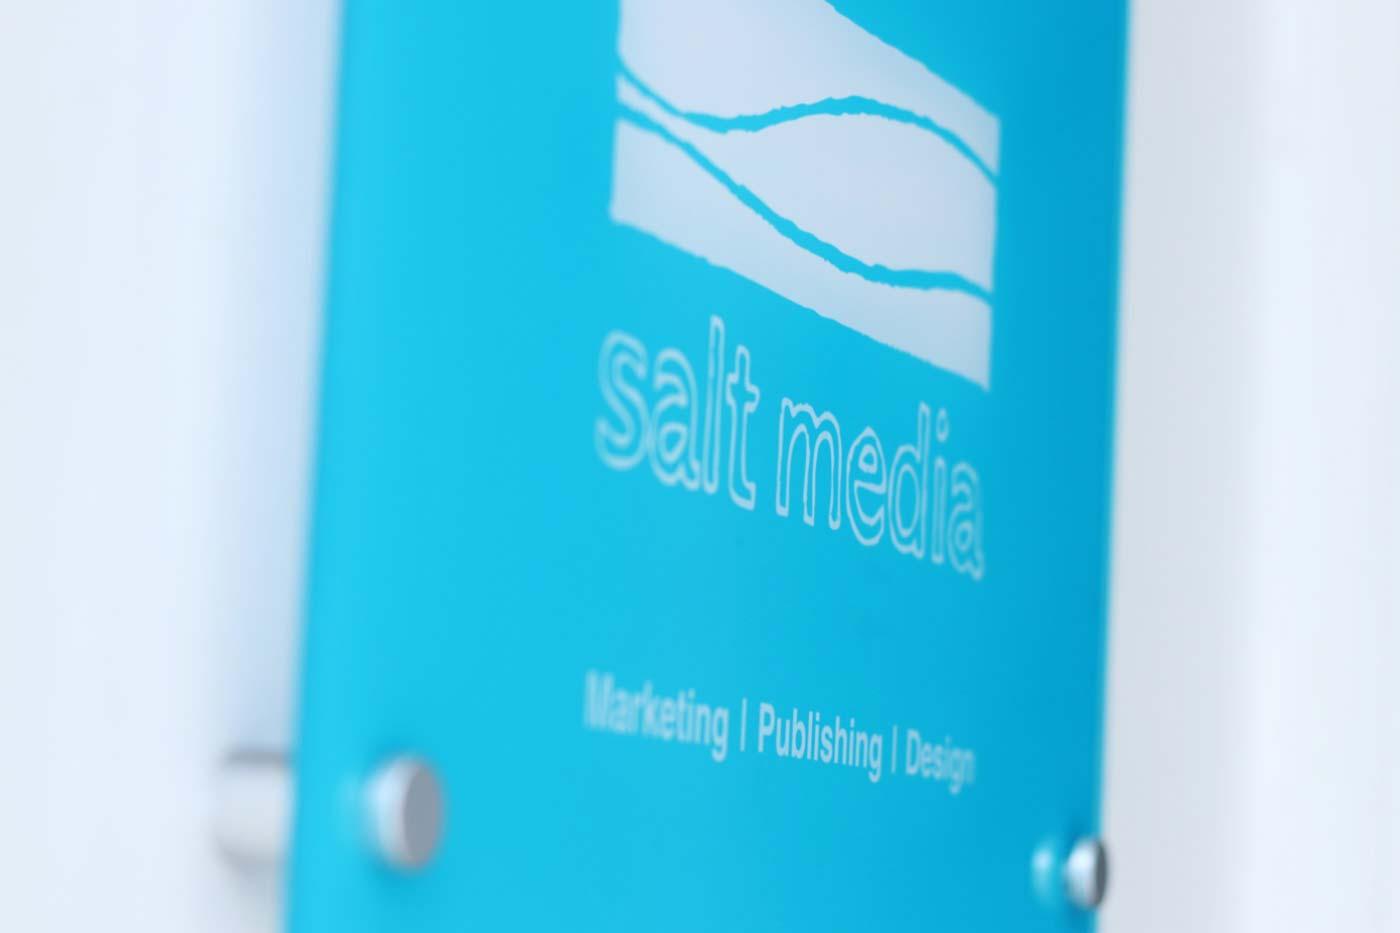 meet the salt media tean